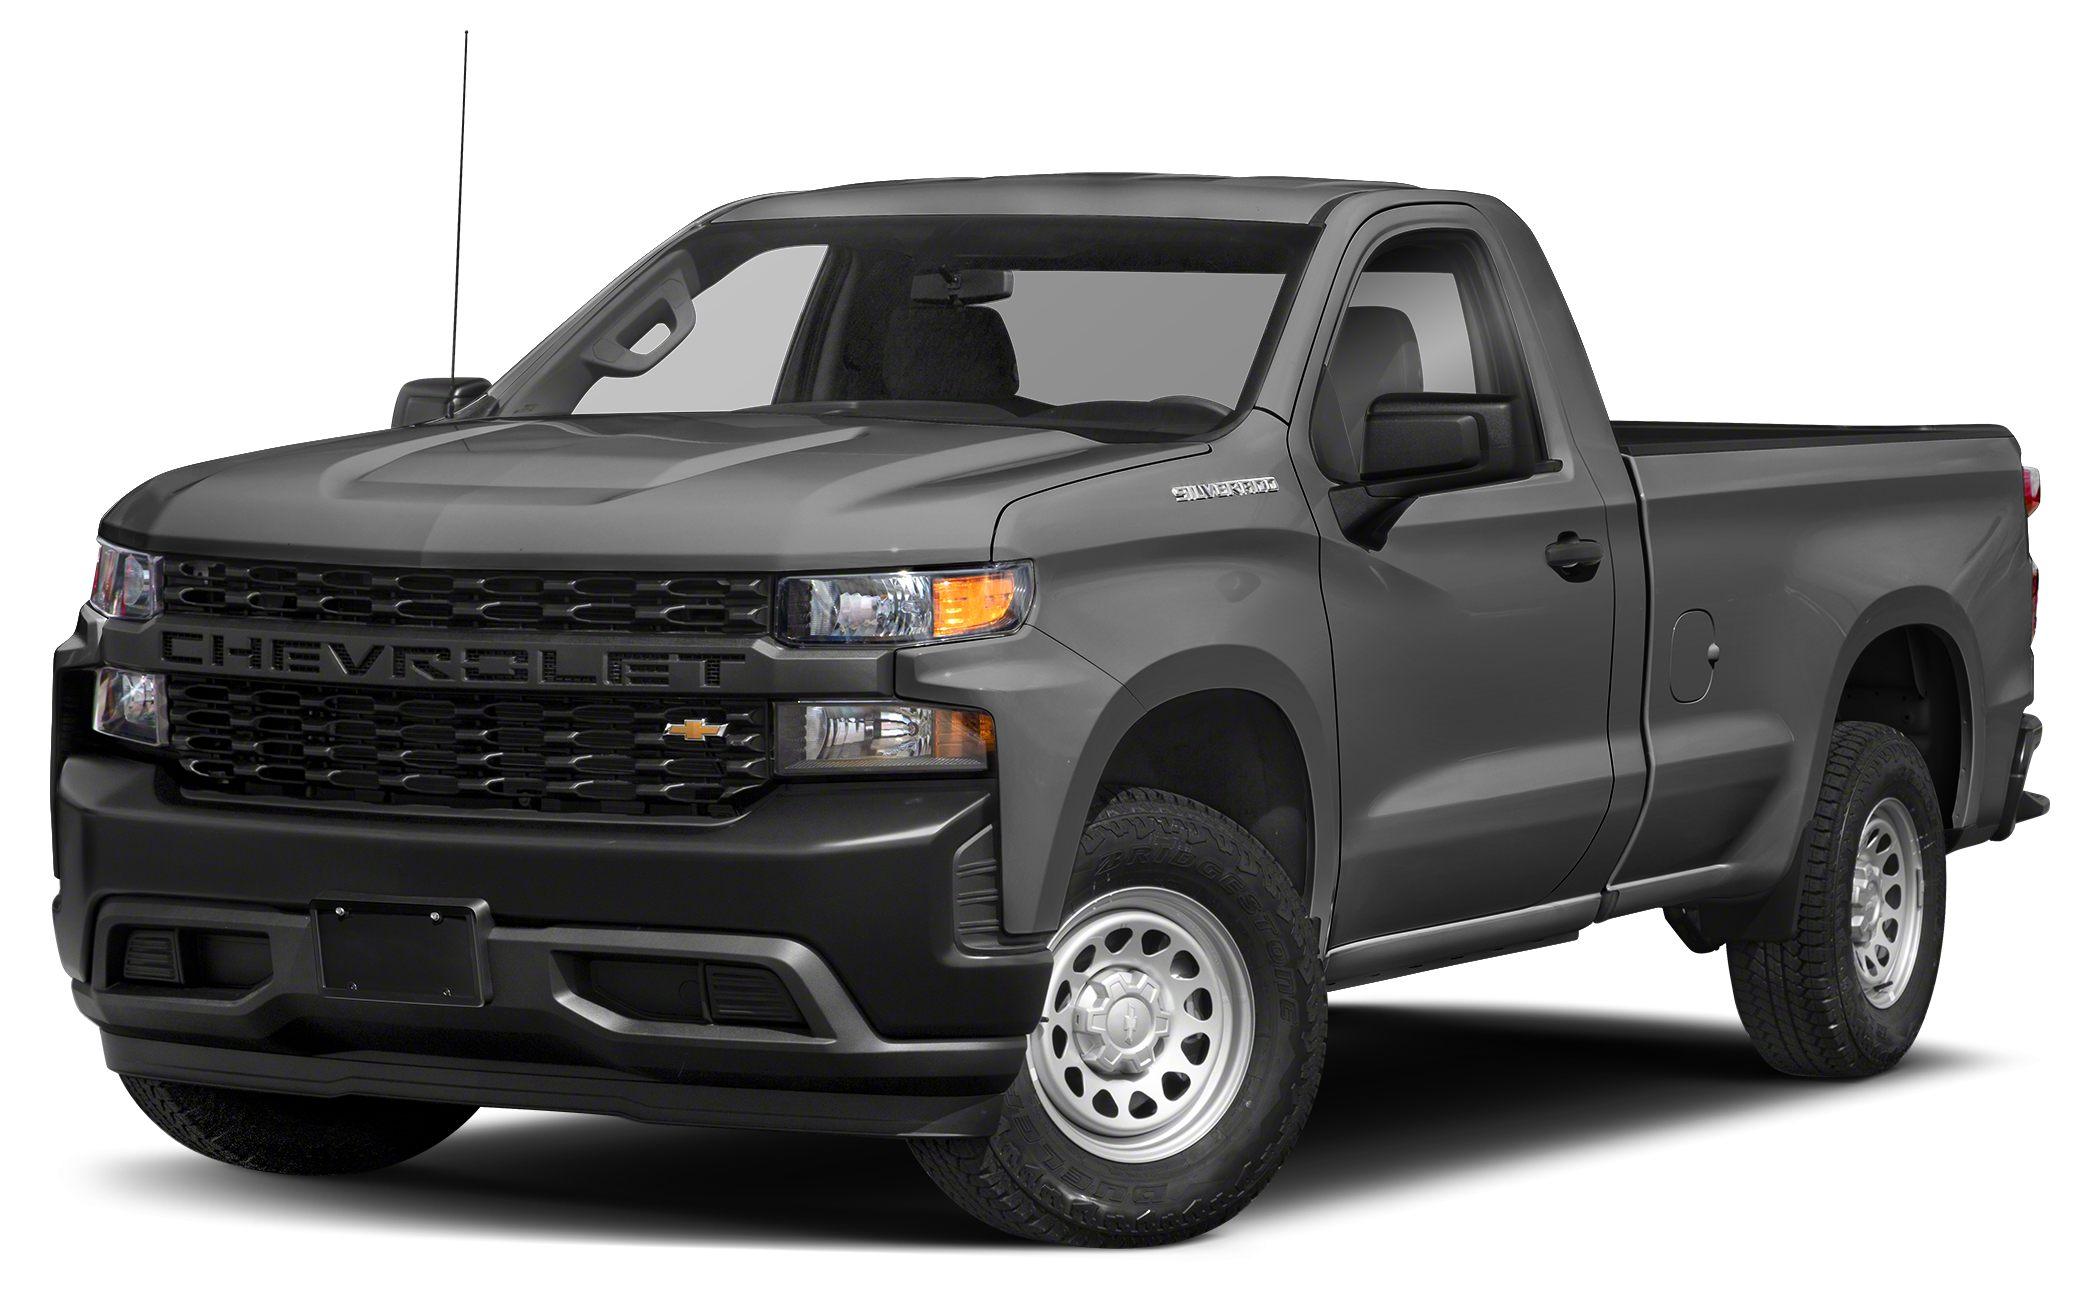 2021 Ram Silverado 1500 Work Truck